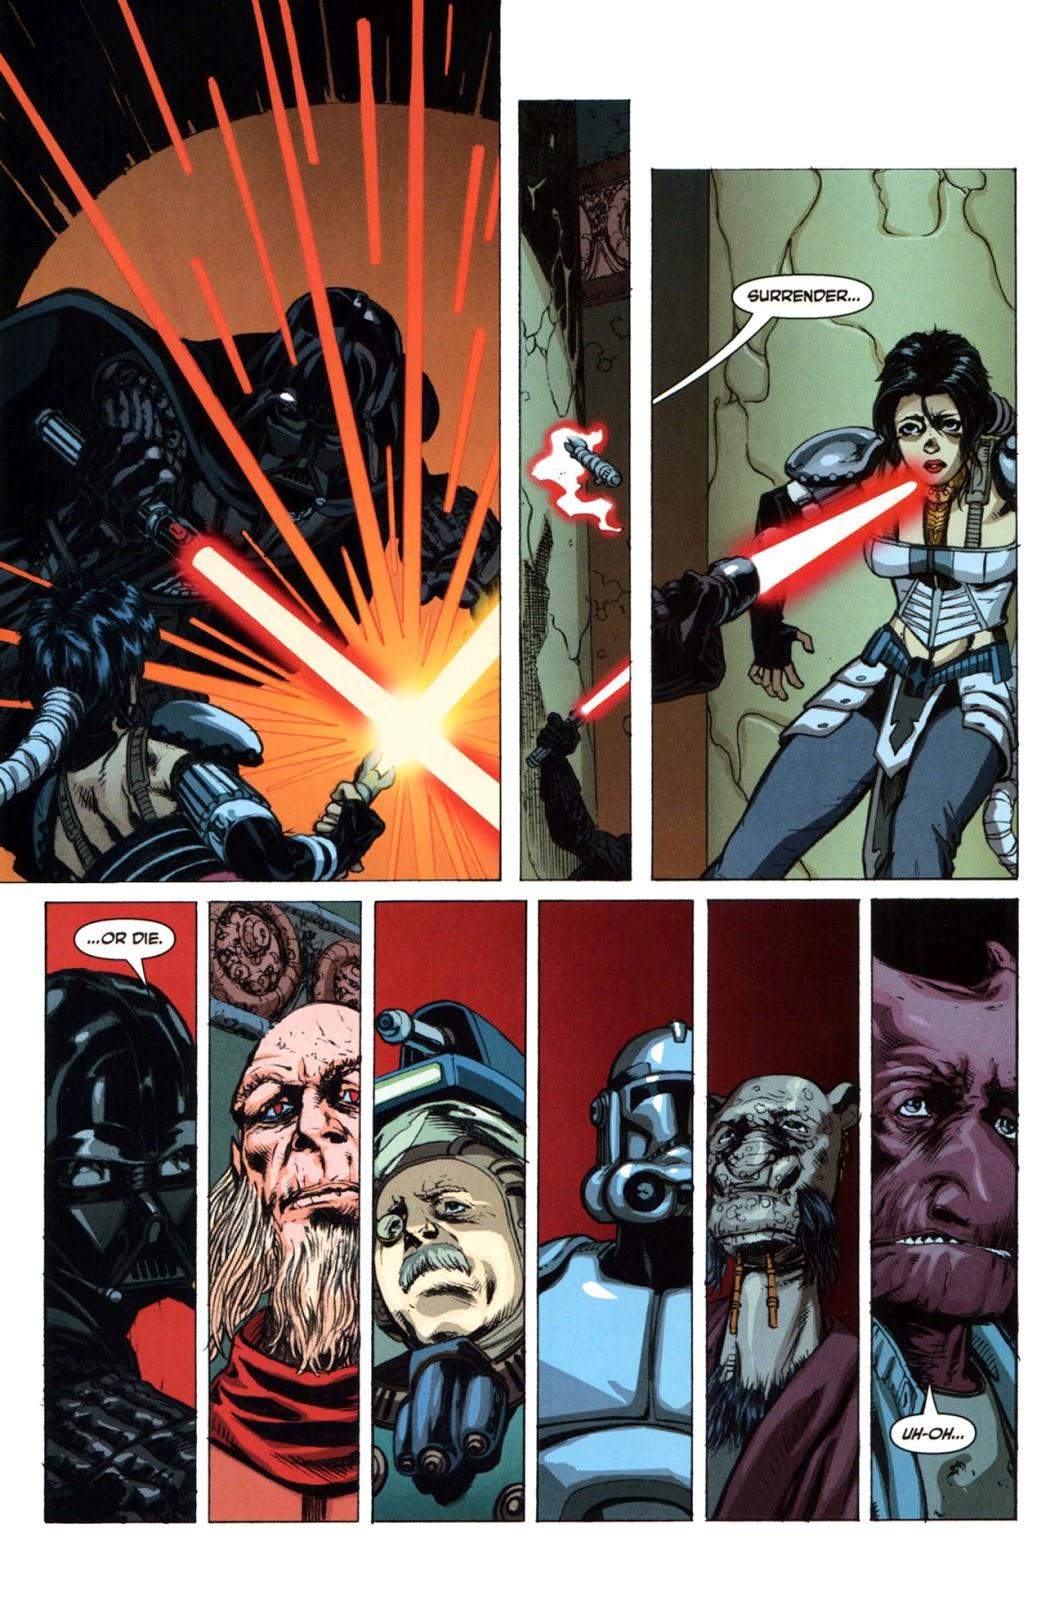 Darth Vader vs A'Sharad Hett - Page 3 Xl2IJGMnrglGQl4pTmXrDkHlKL4Lwsll8uiVq5g5o3an5ASnoOTP3WedJQekKuTjoAy3U1FFoY9wcB2yDUyYk0EoOnDoCyv6GyjNWjTrUXhXtdi3JWDjjvajT8WCnri7yOSwlrTg